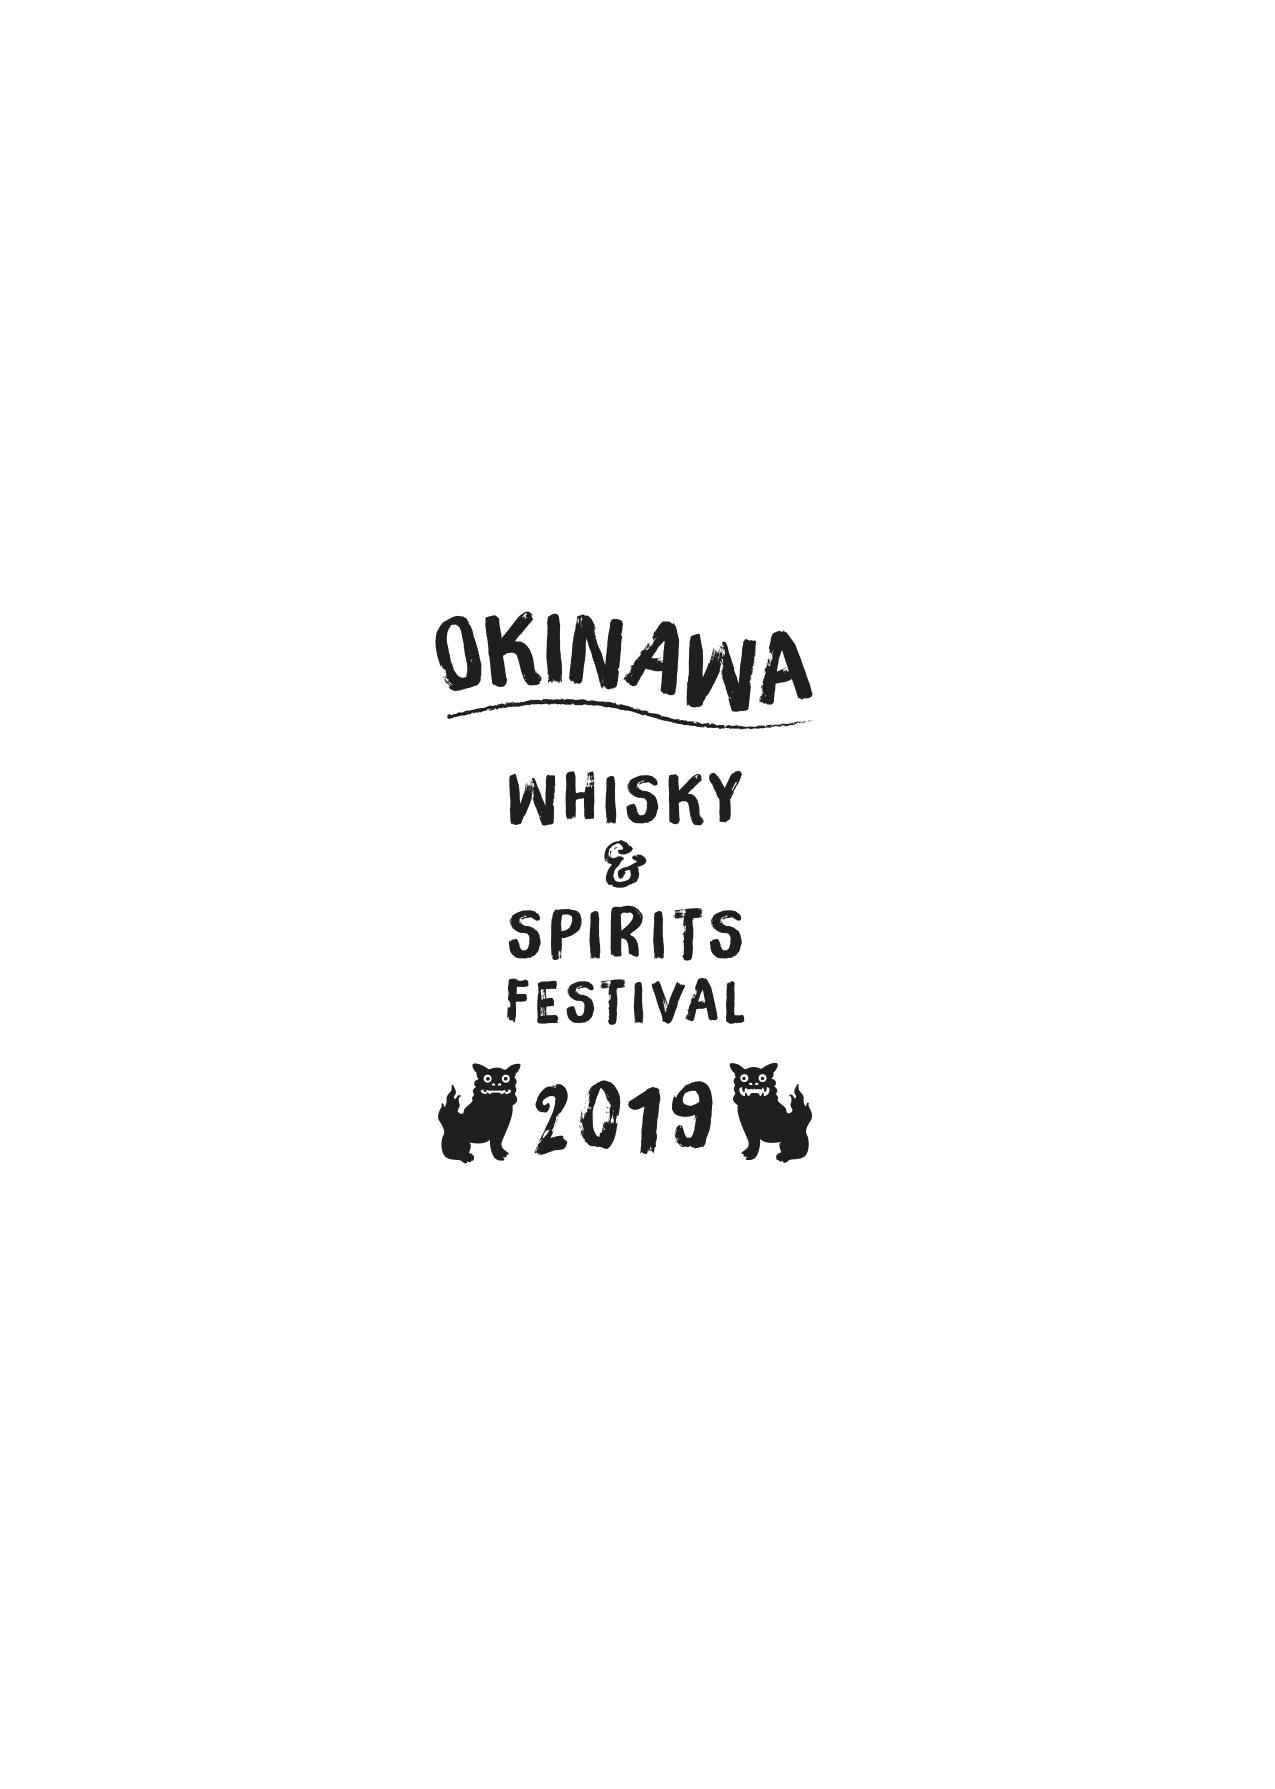 OKINAWA WHISKY&SPIRITS FESTIVAL 2019